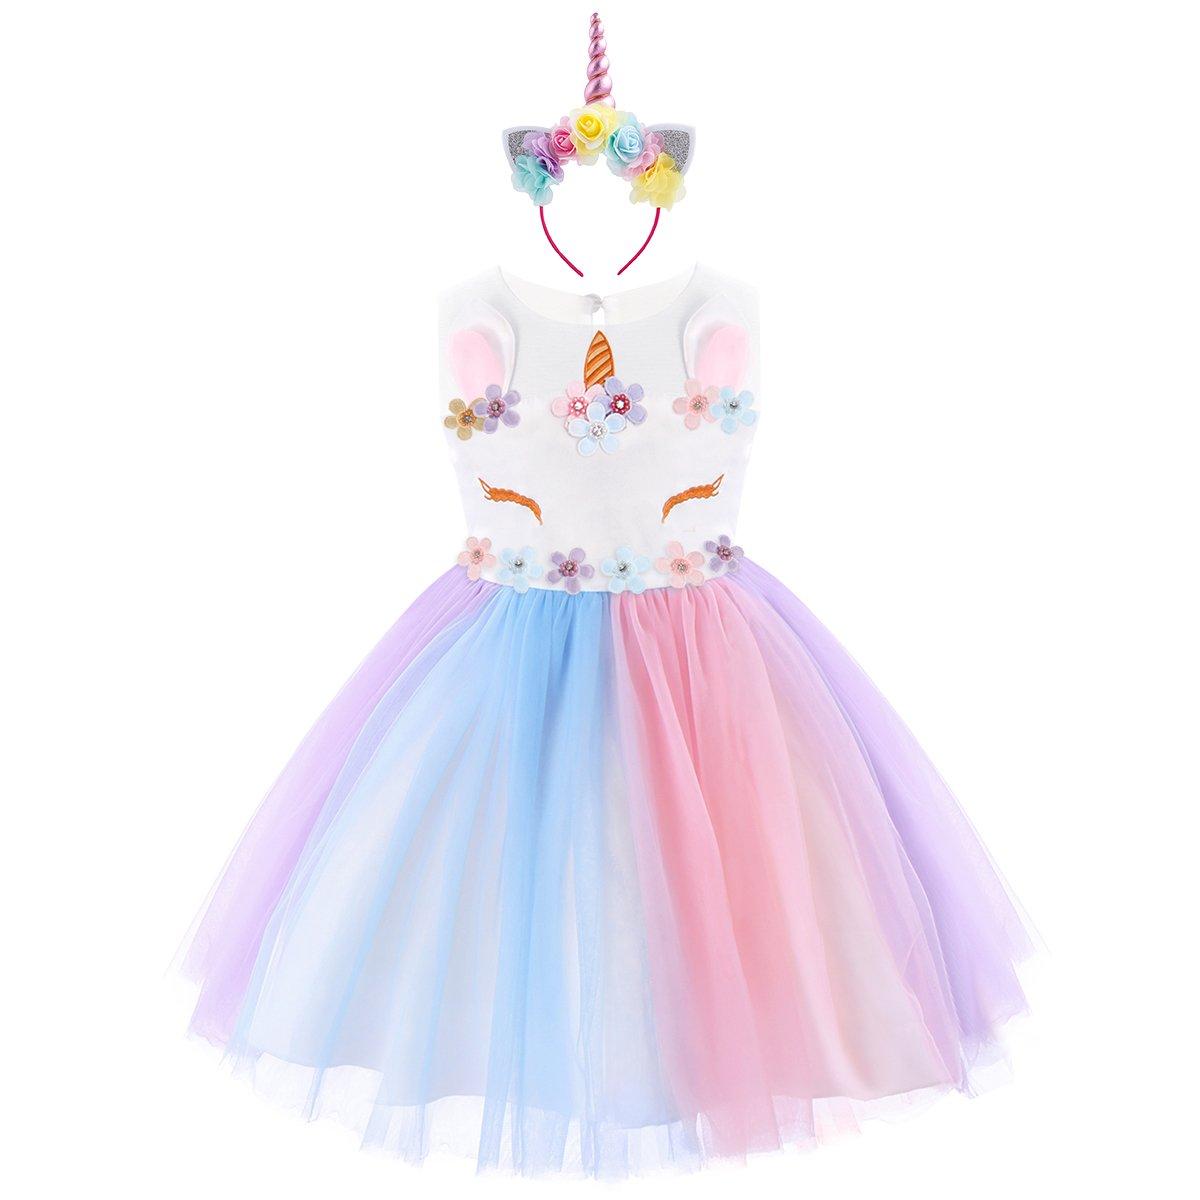 Baby Girls Unicorn Rainbow Party Dress Toddler Sleeveless Princess Birthday Wedding Dress Halloween Dressing Up Costumes with Headband 2-3 Years